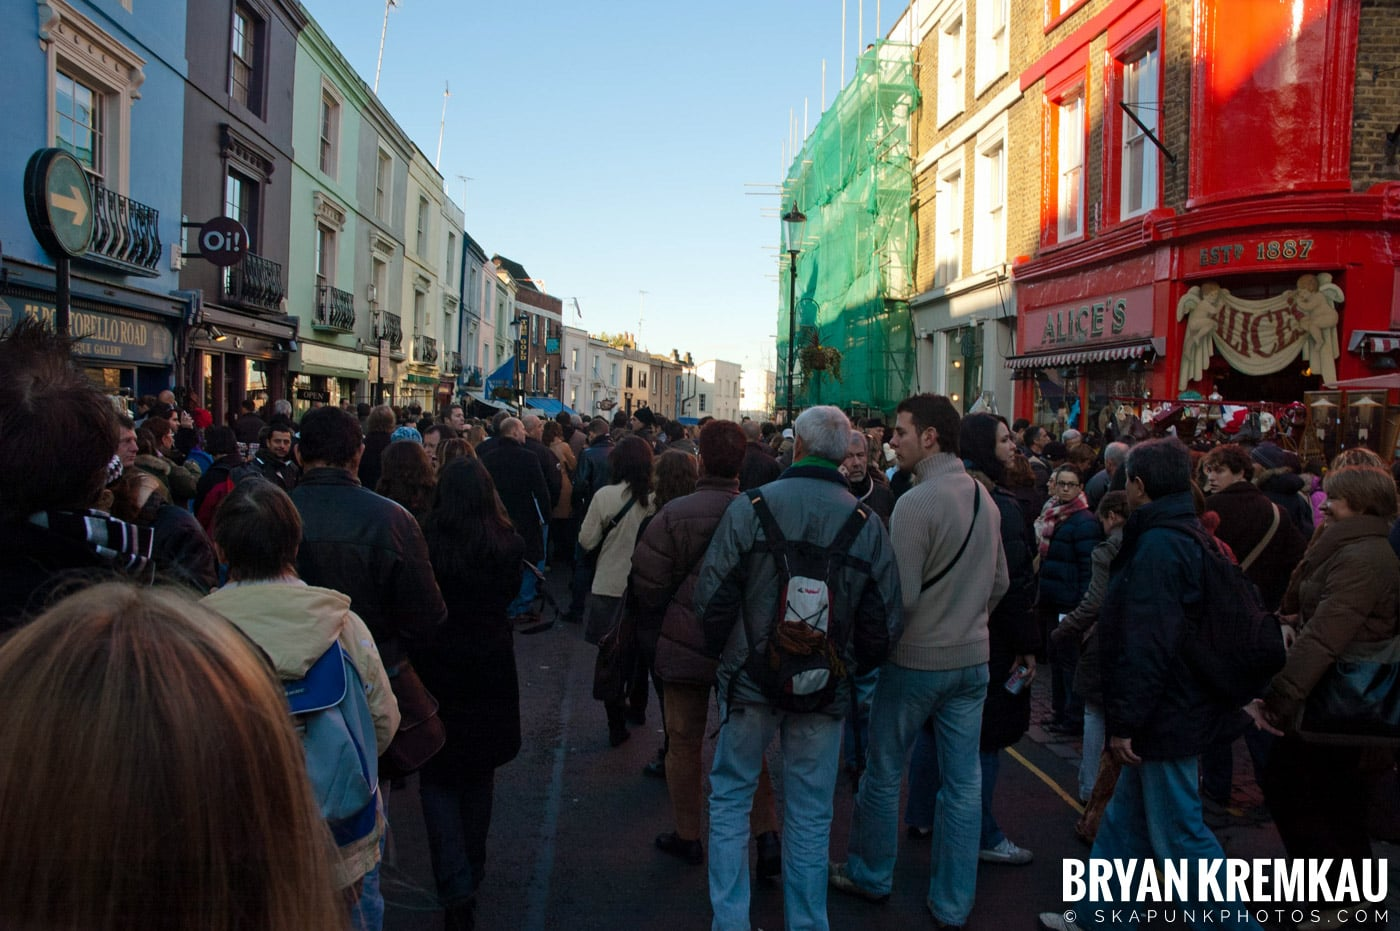 London, England - Day 2 - 12.9.06 (29)